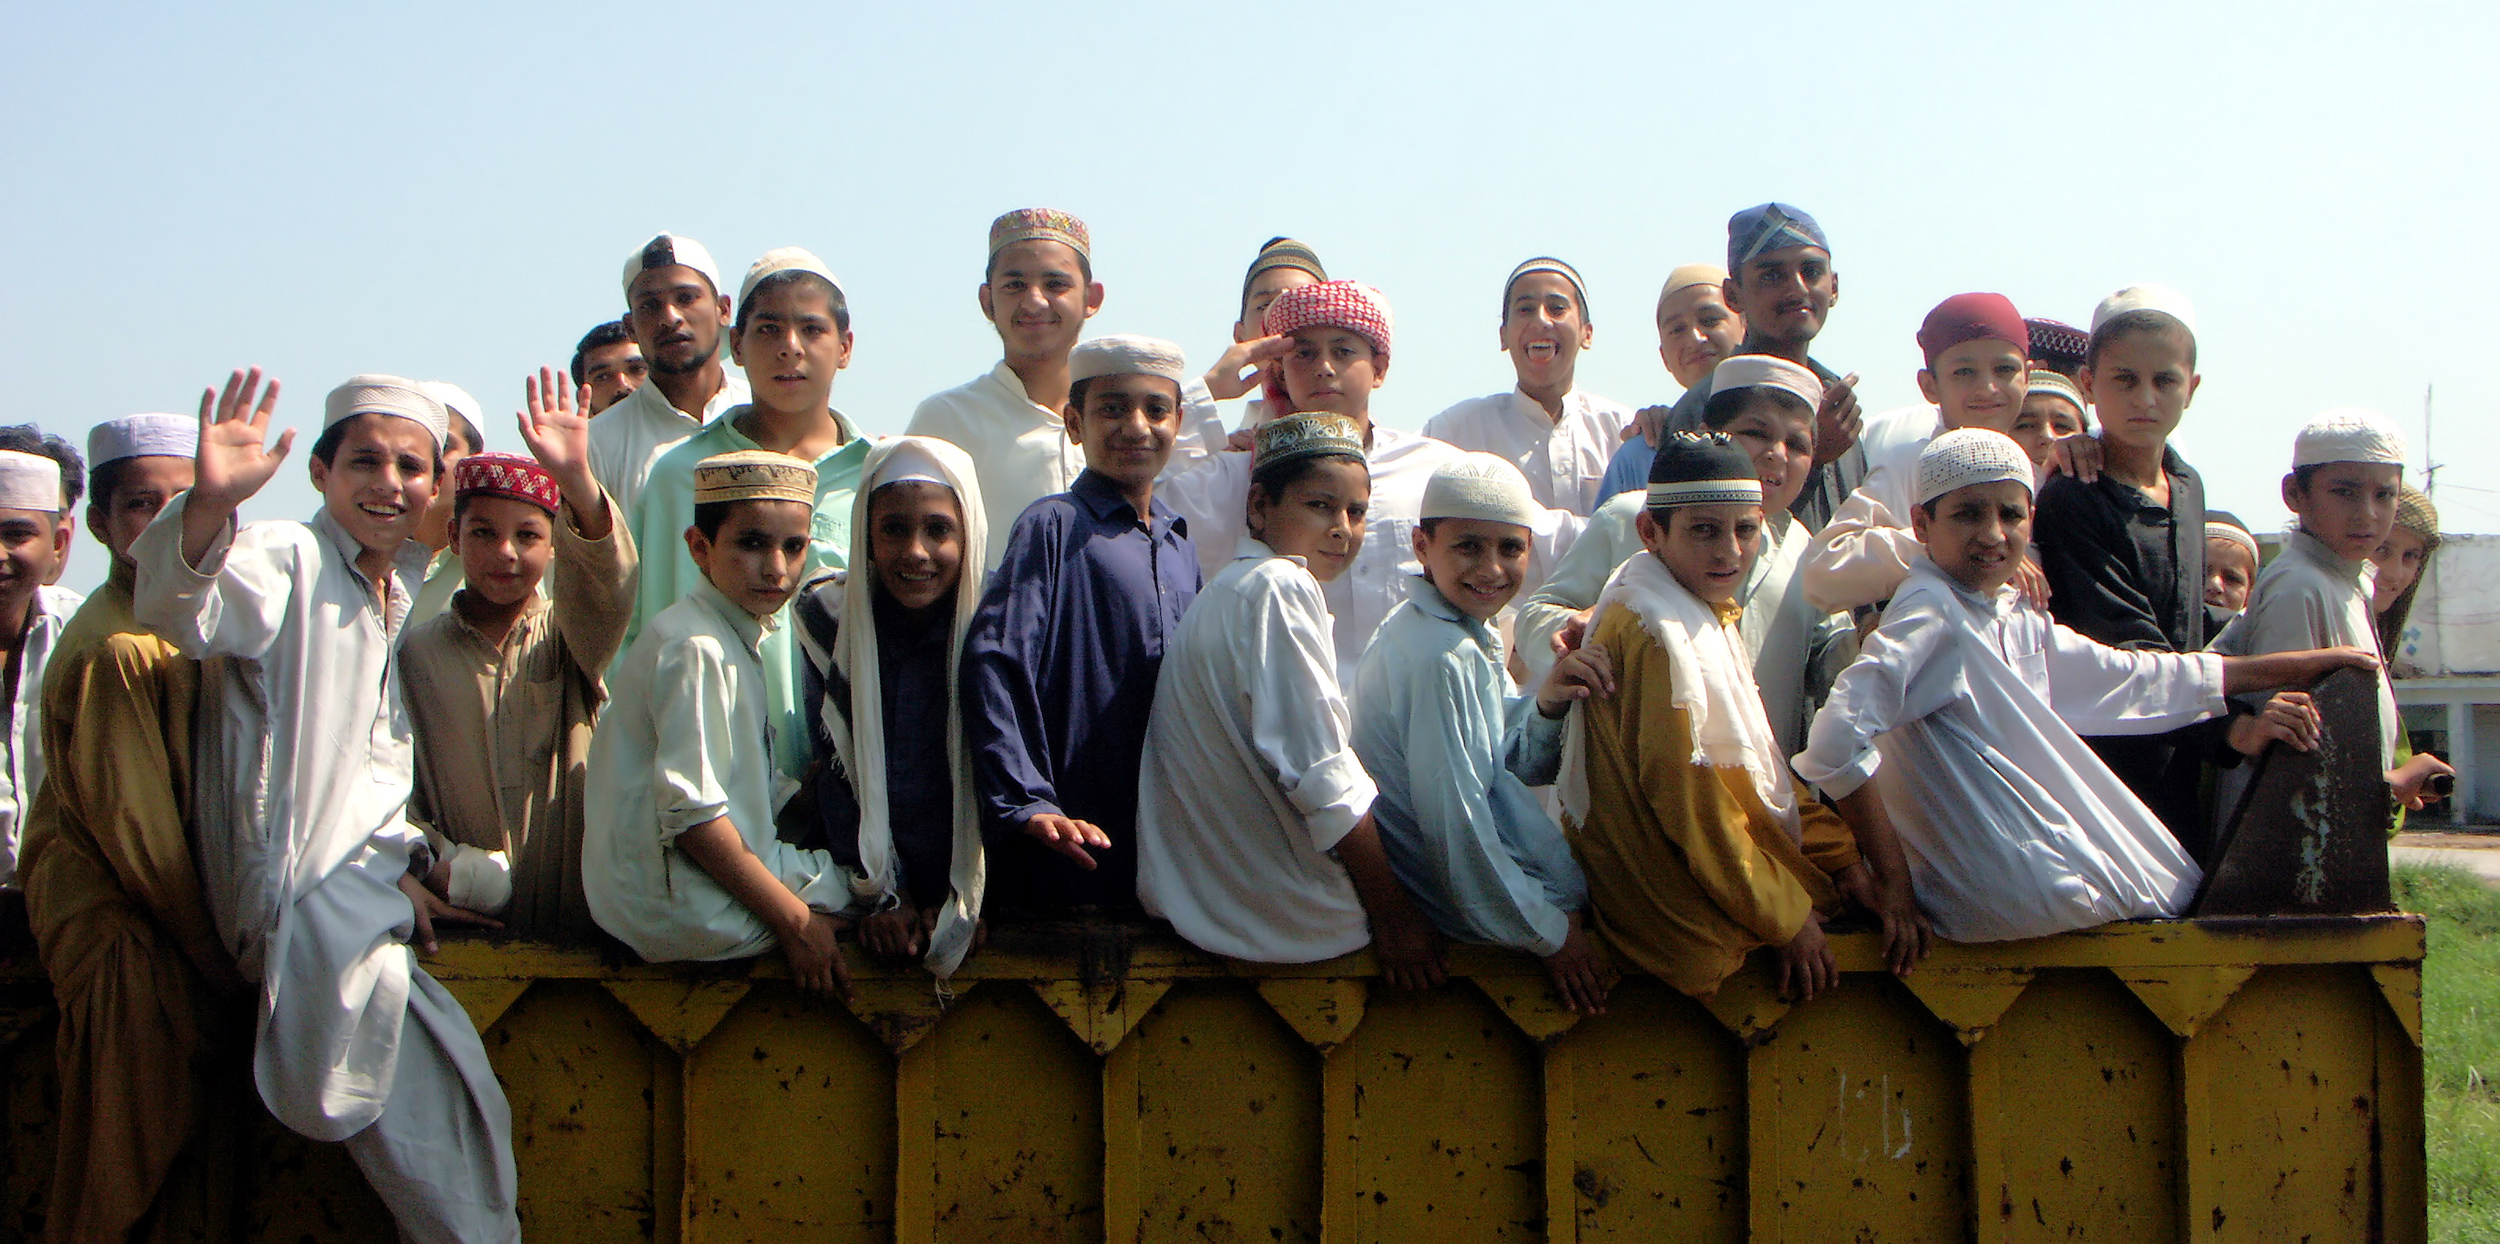 055 PB Madrassa students.jpg